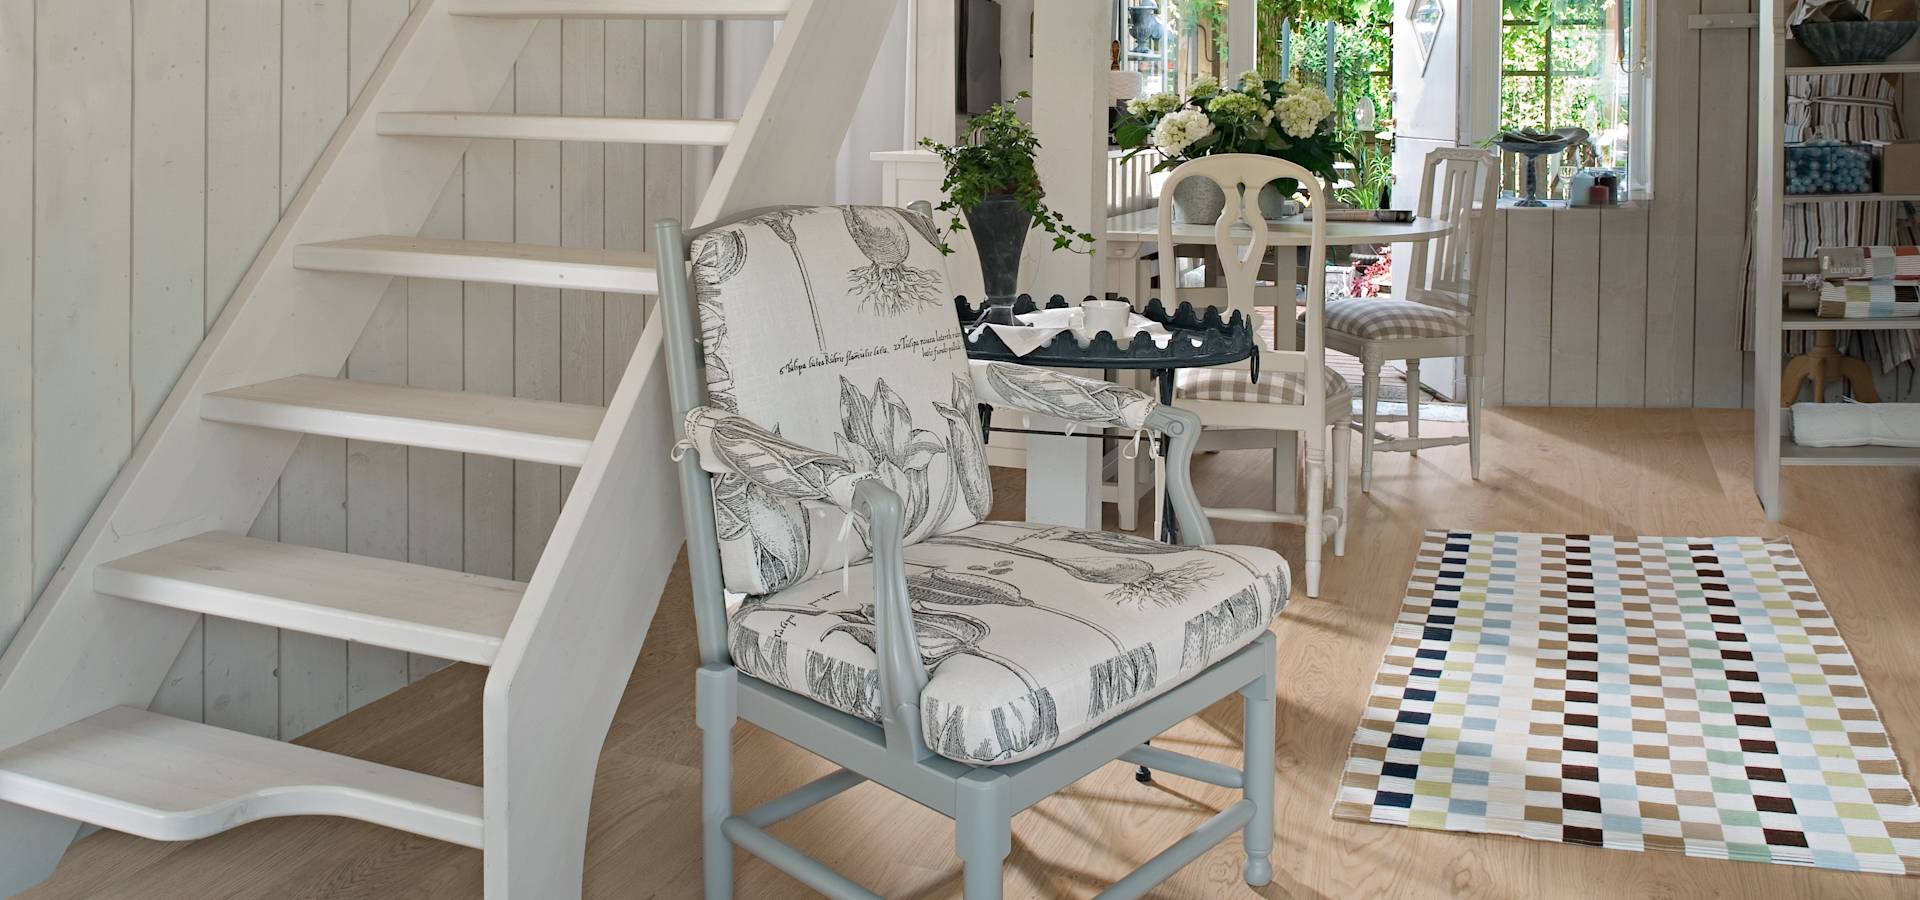 k hrs parkett deutschland t bingen yer d emeleri homify. Black Bedroom Furniture Sets. Home Design Ideas